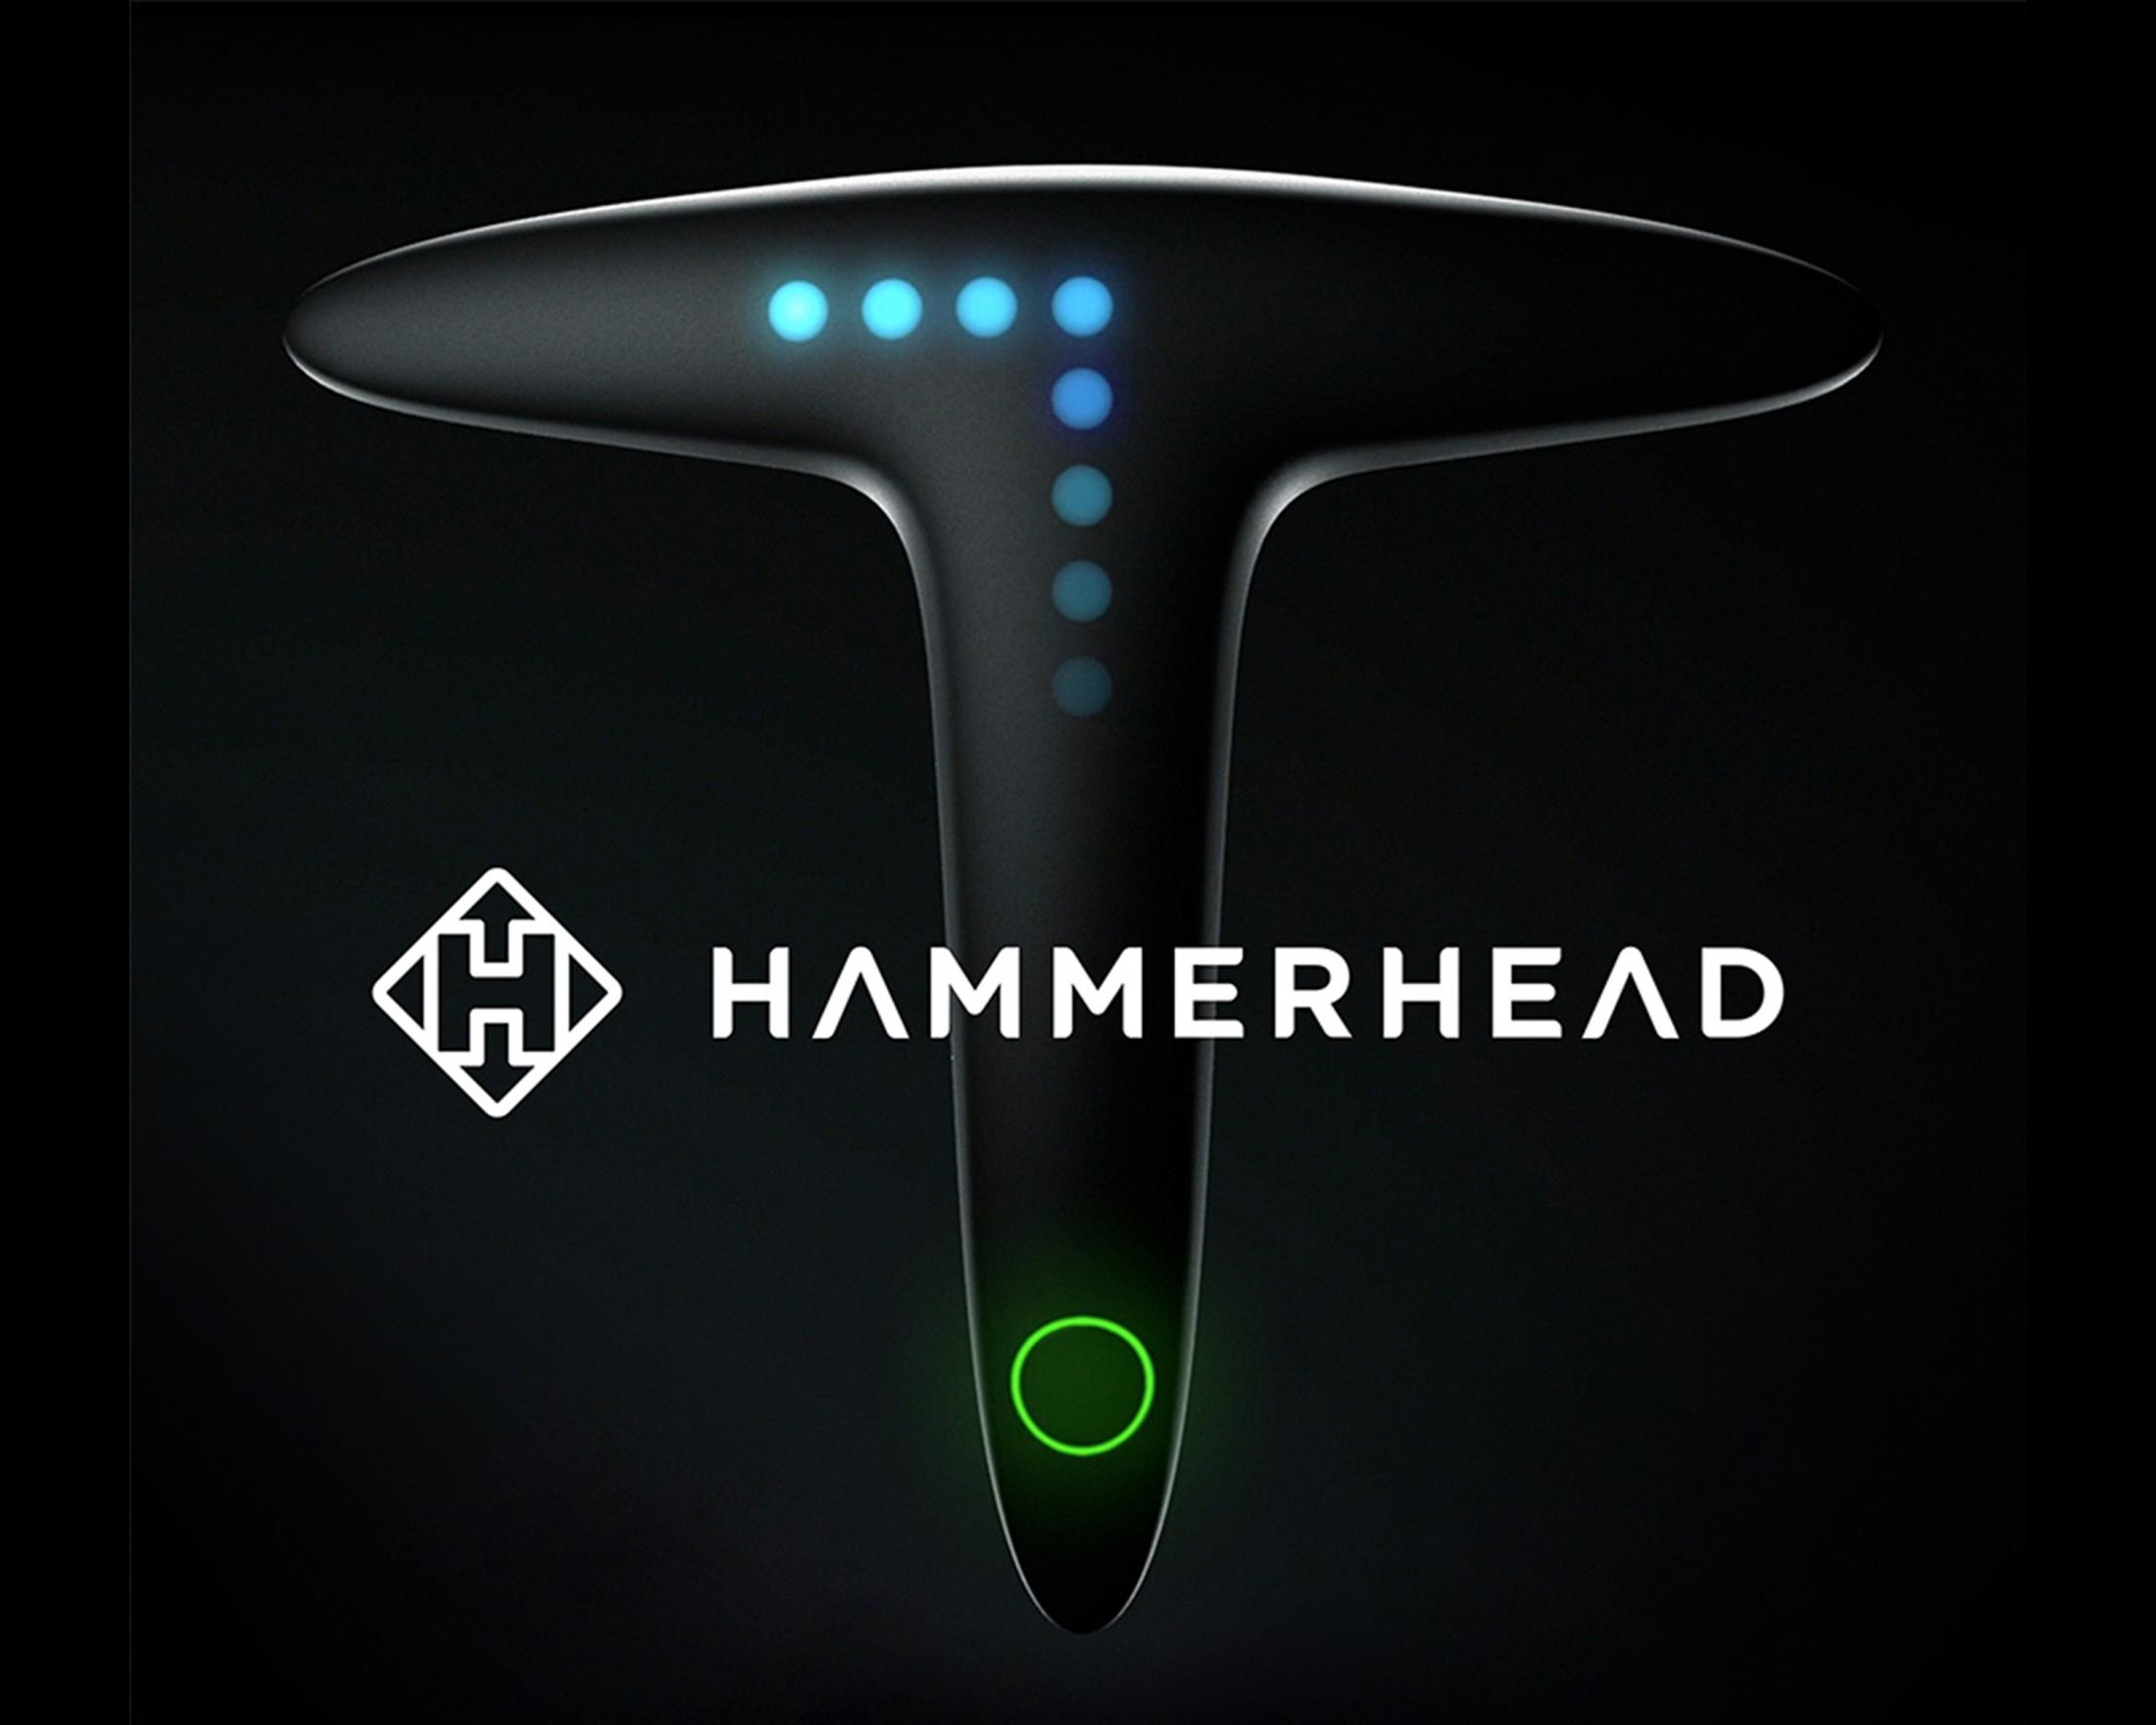 Thumbnail for Hammerhead